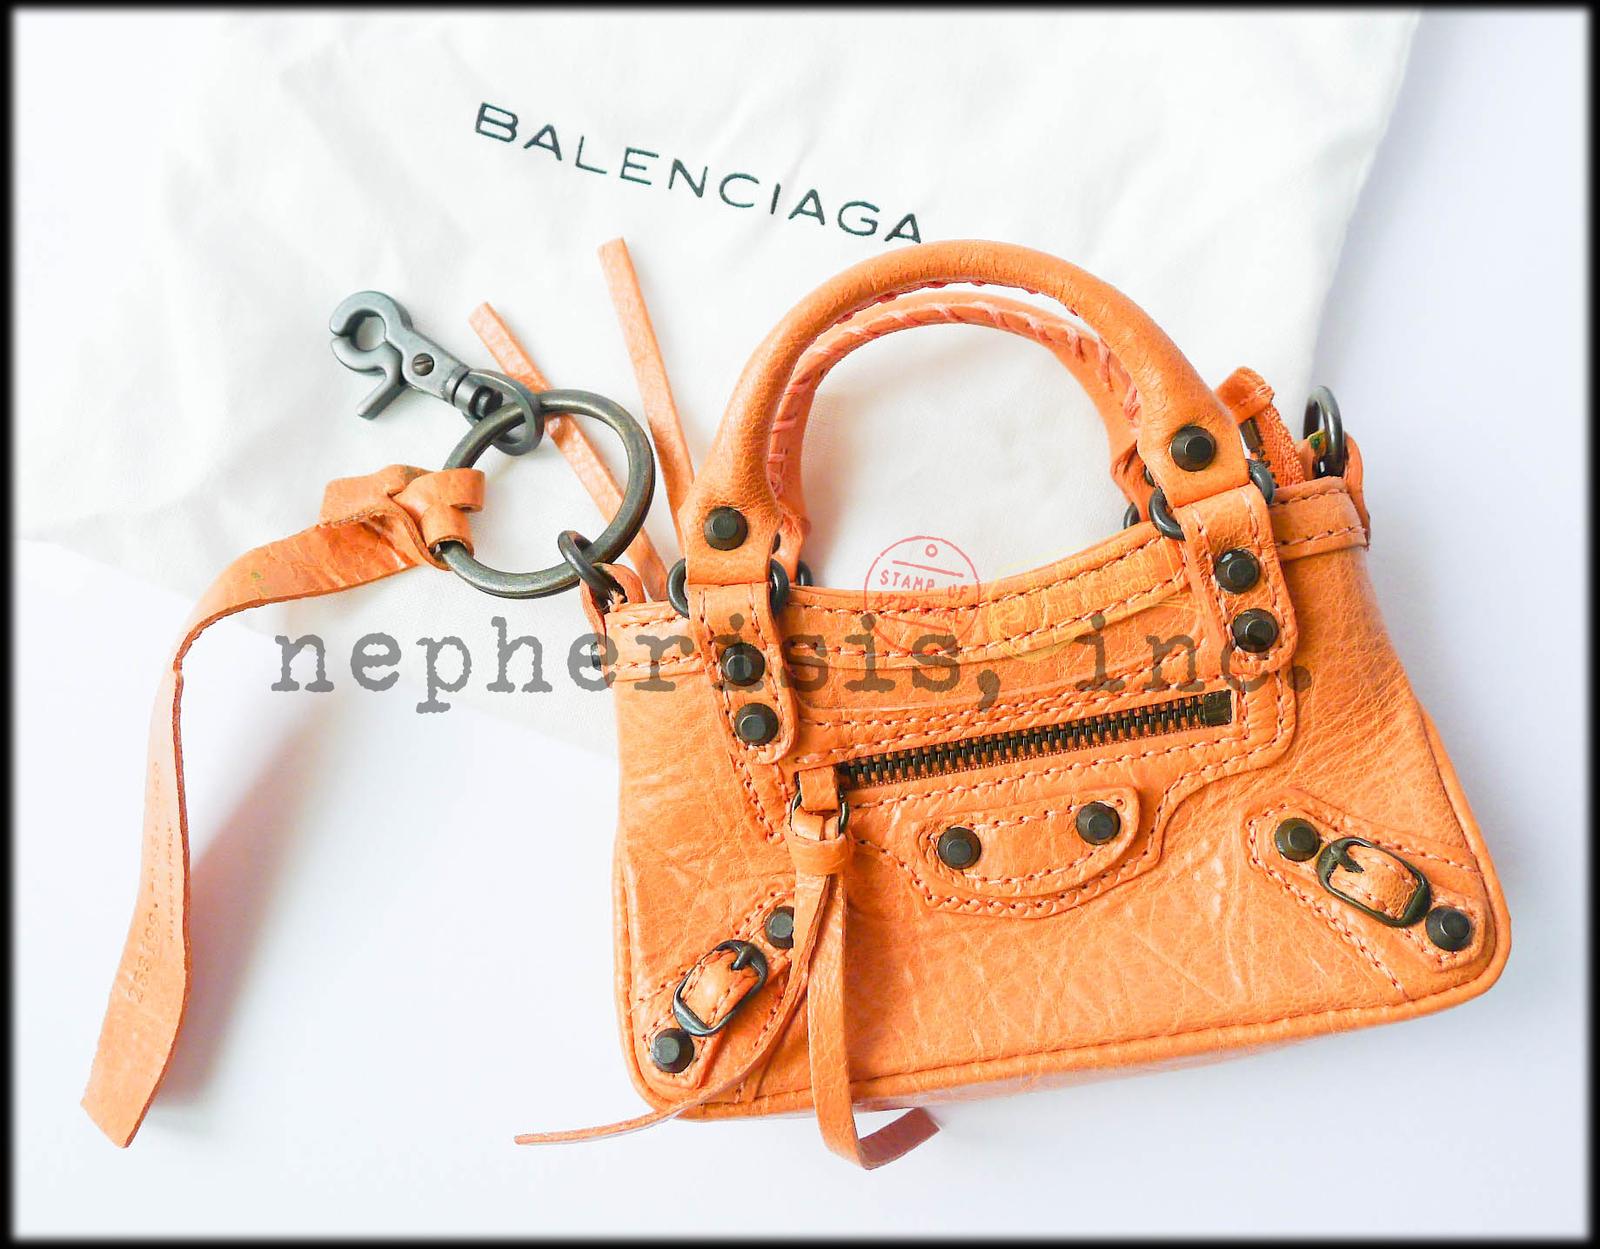 AUTH NEW 2012 Balenciaga MINI MINI FIRST MMF Keychain or Bag Charm ROSE BLUSH image 5